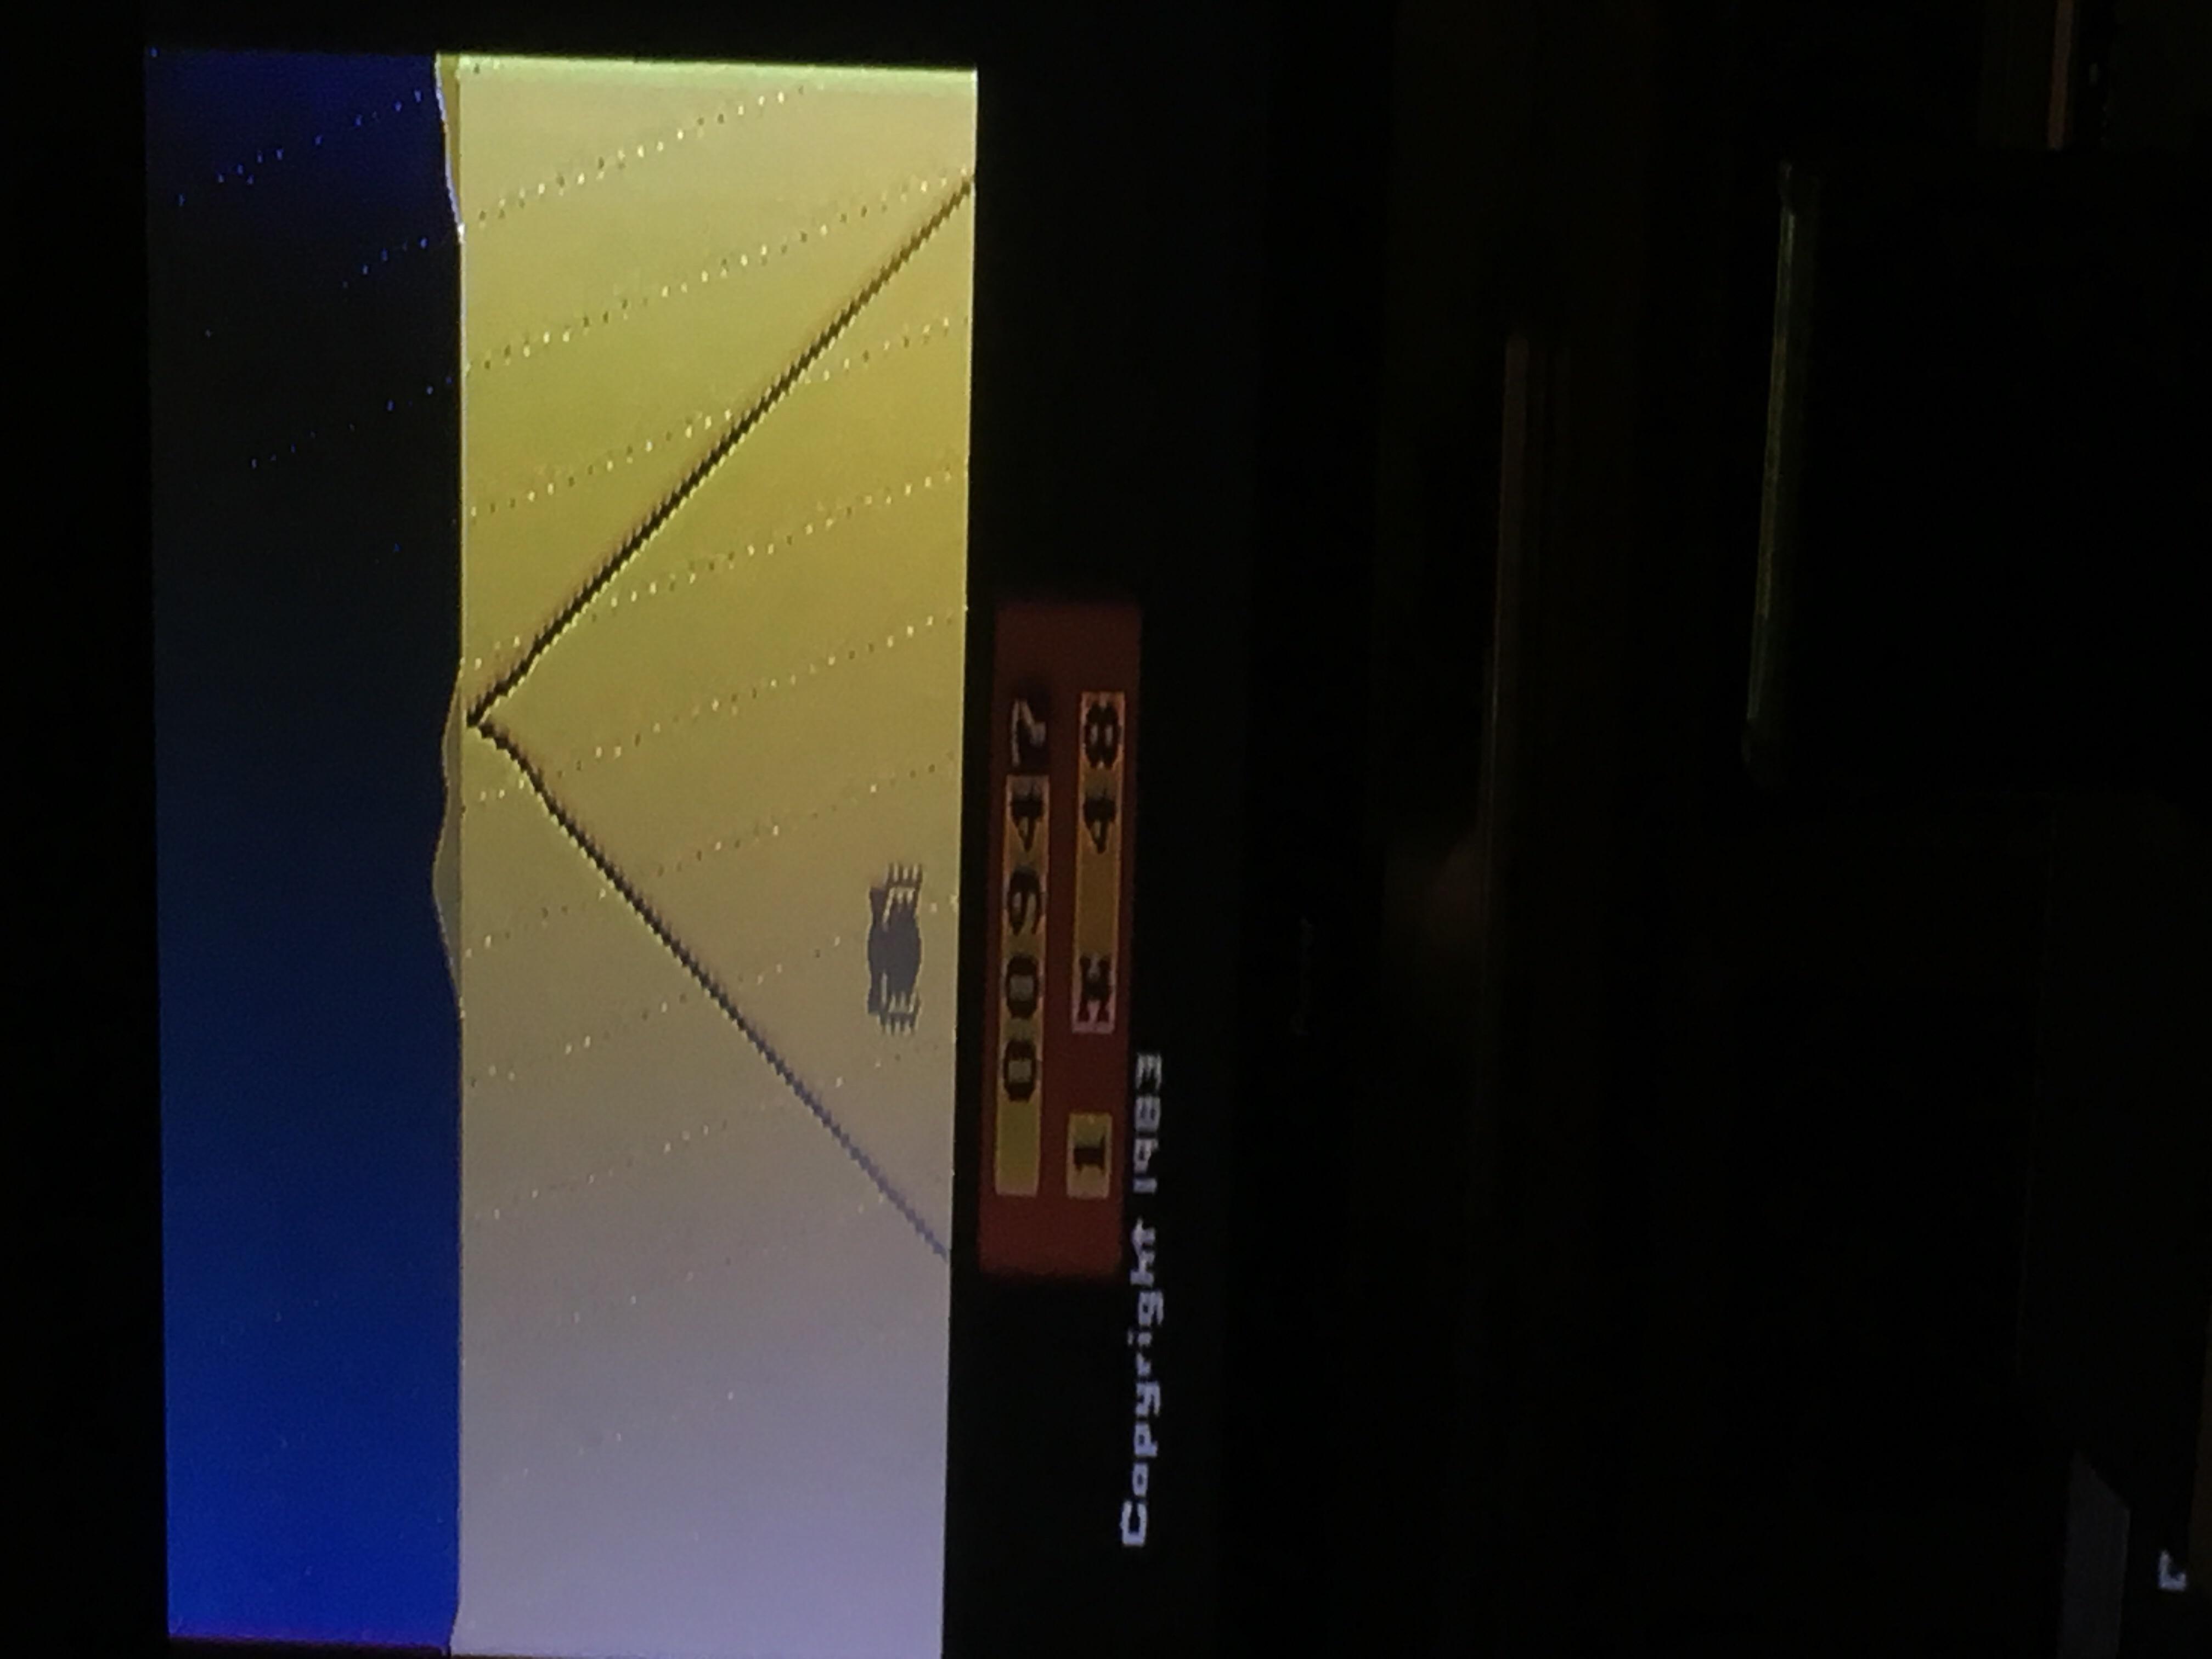 Pixel0501: Enduro (Atari 2600 Novice/B) 947 points on 2018-09-23 17:34:52